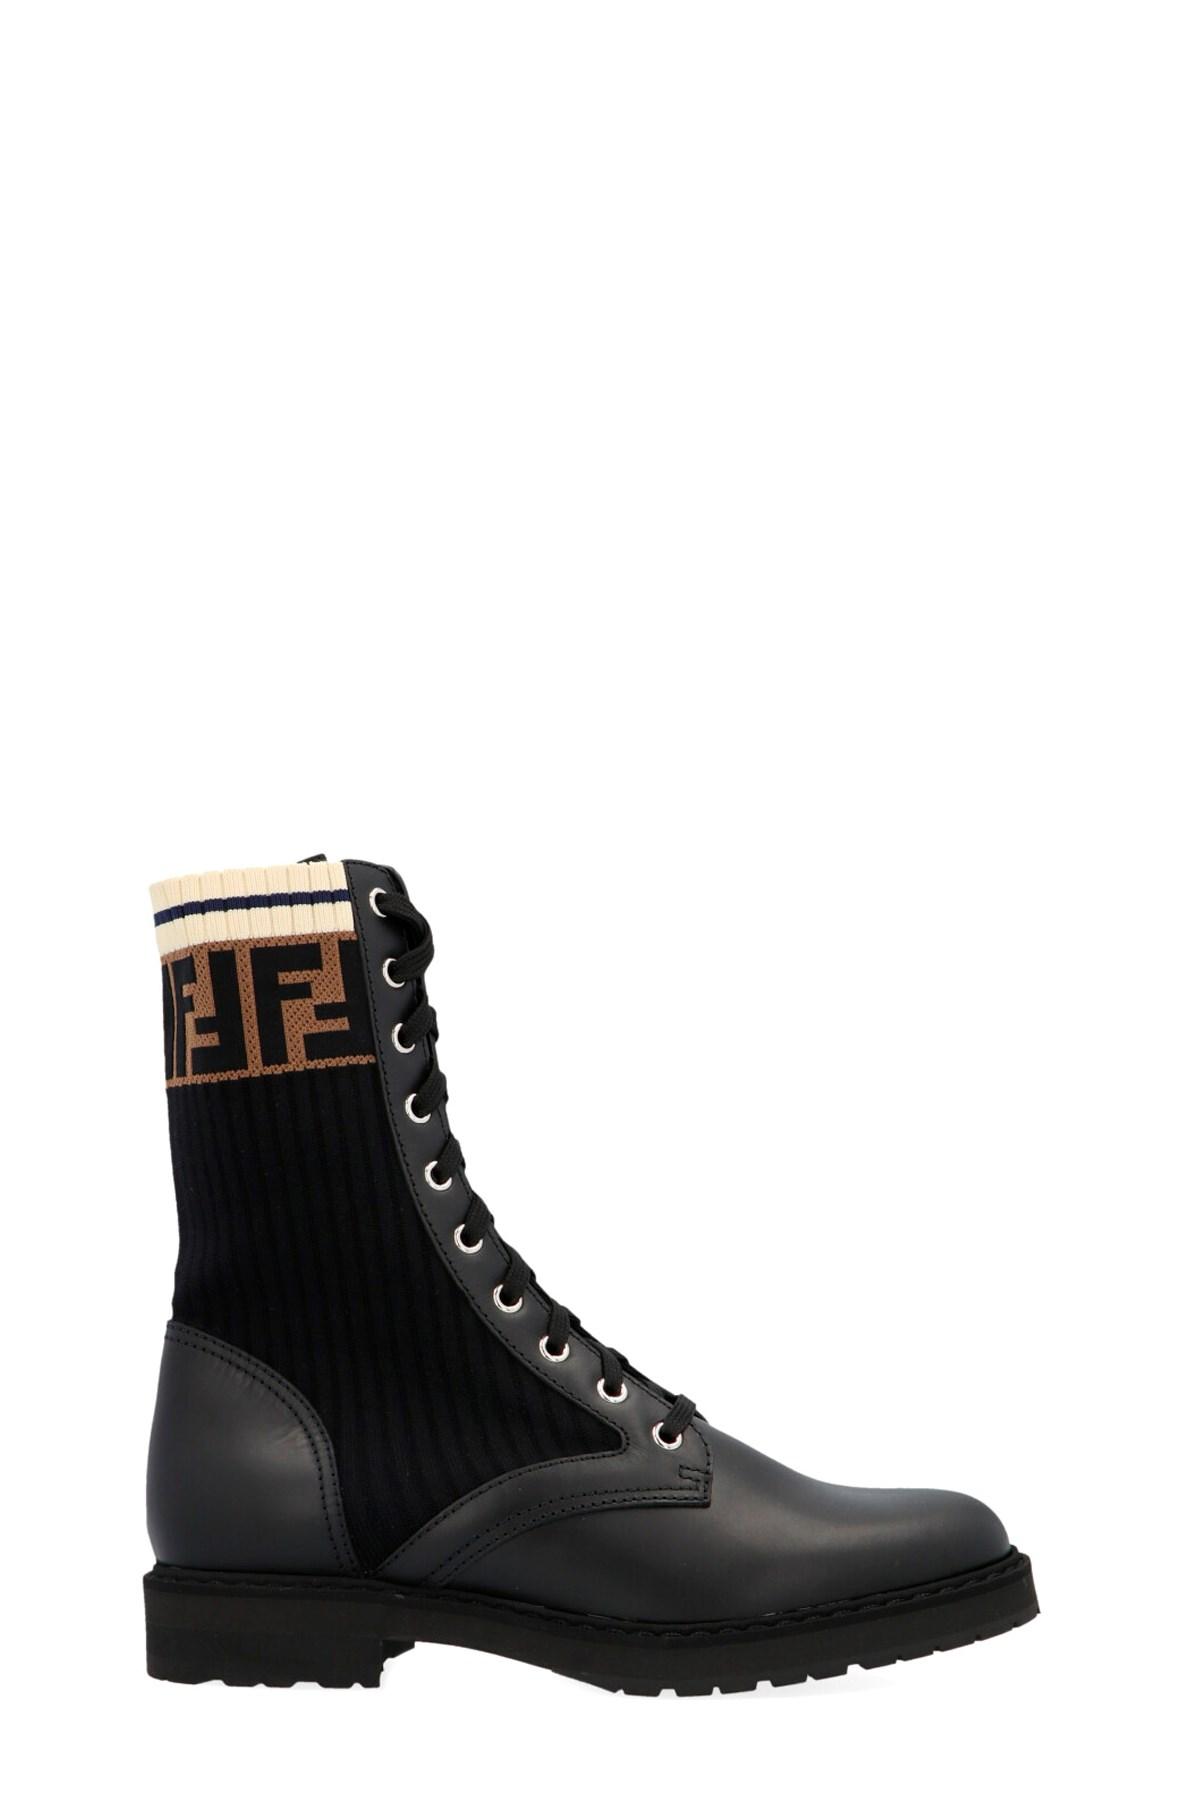 fendi 'Rockoko' combat boots available